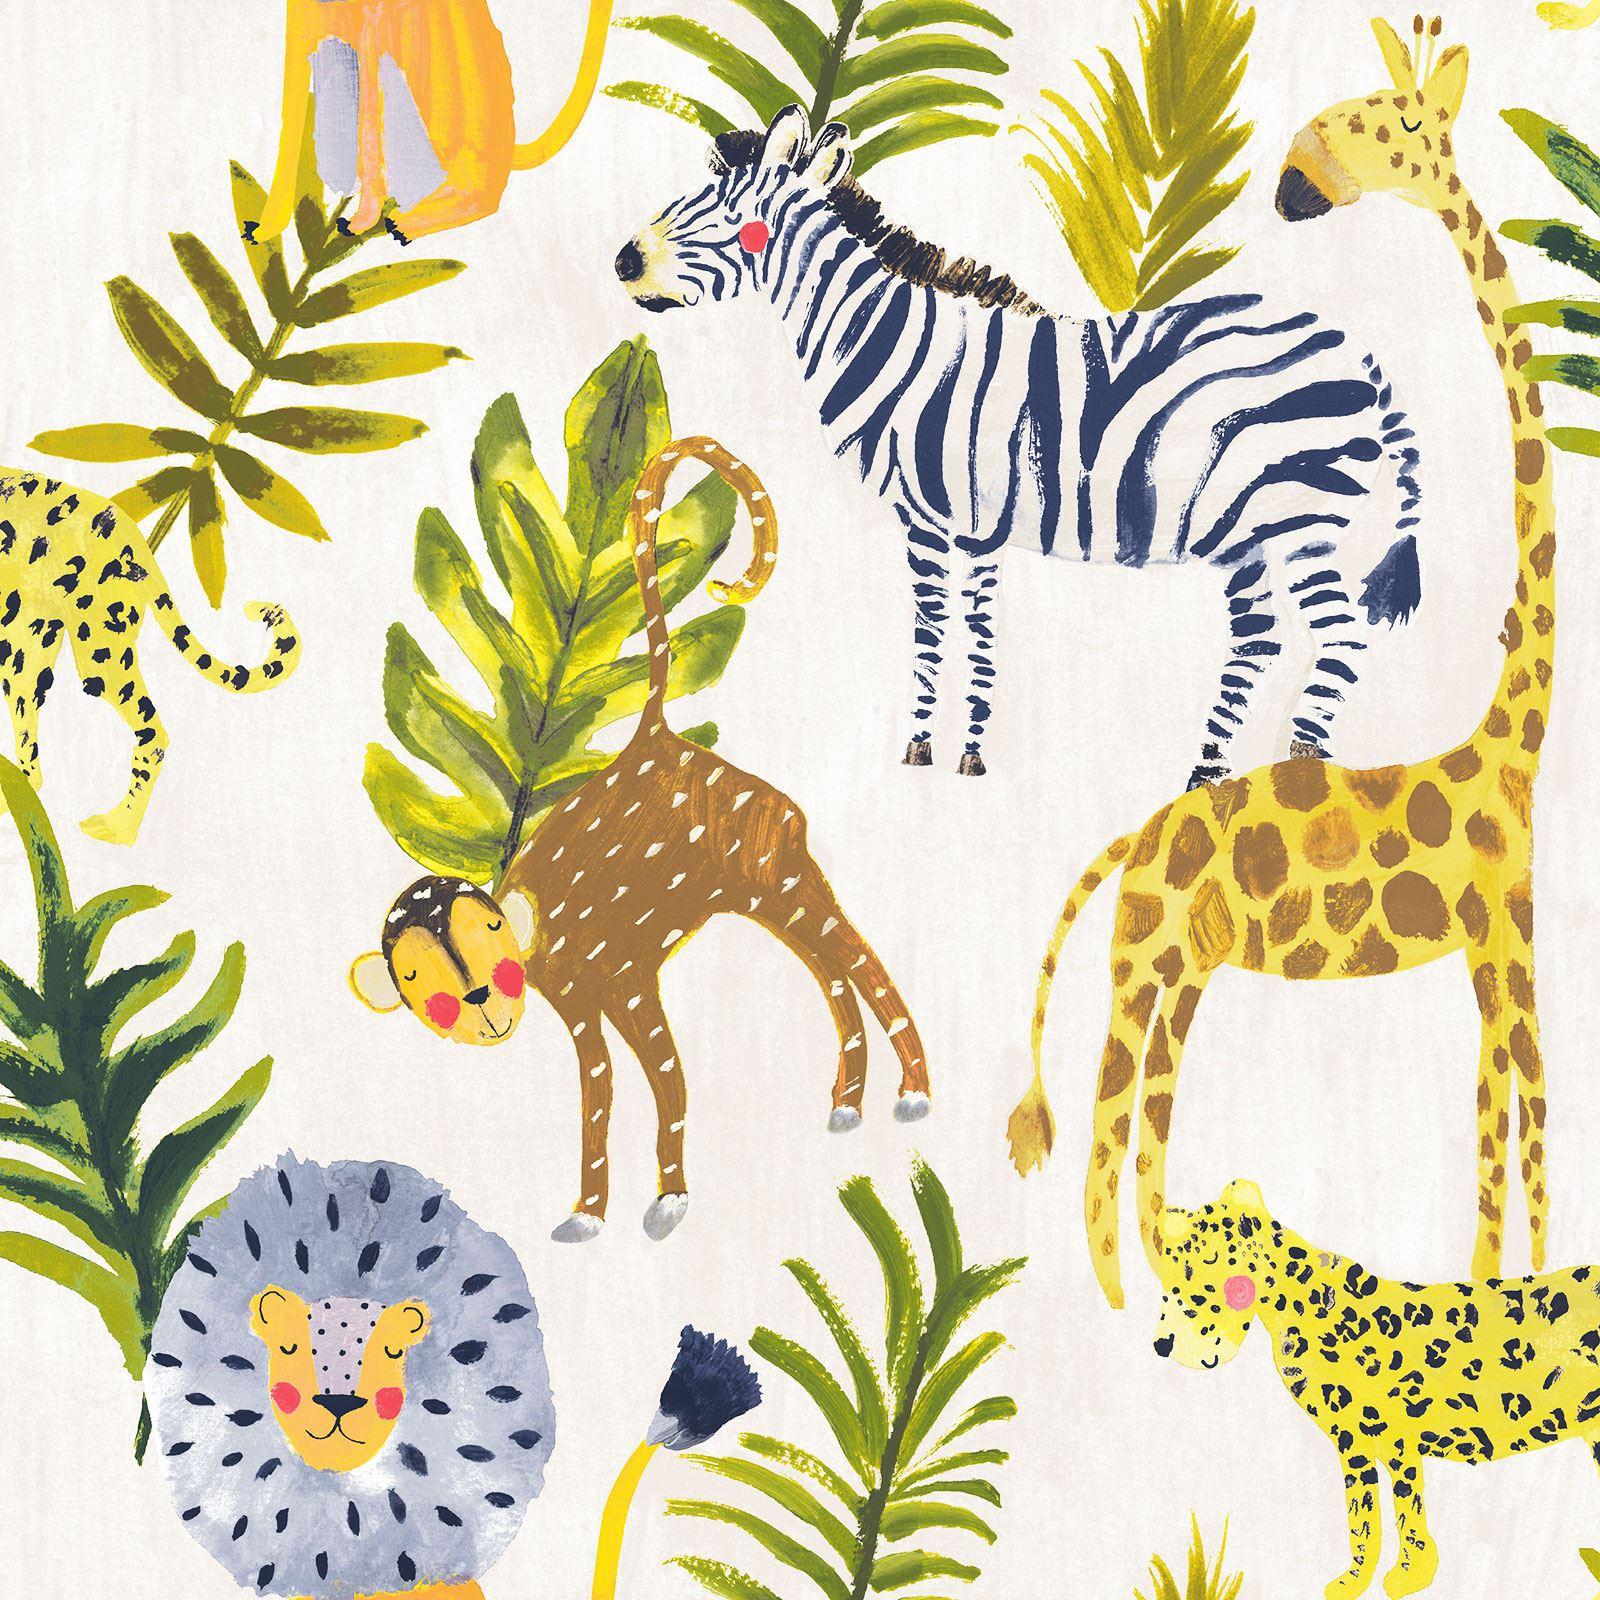 Details About Little Ones Eco Safari Wallpaper Grandeco Lo2201 Zebra Giraffe Lion Kids